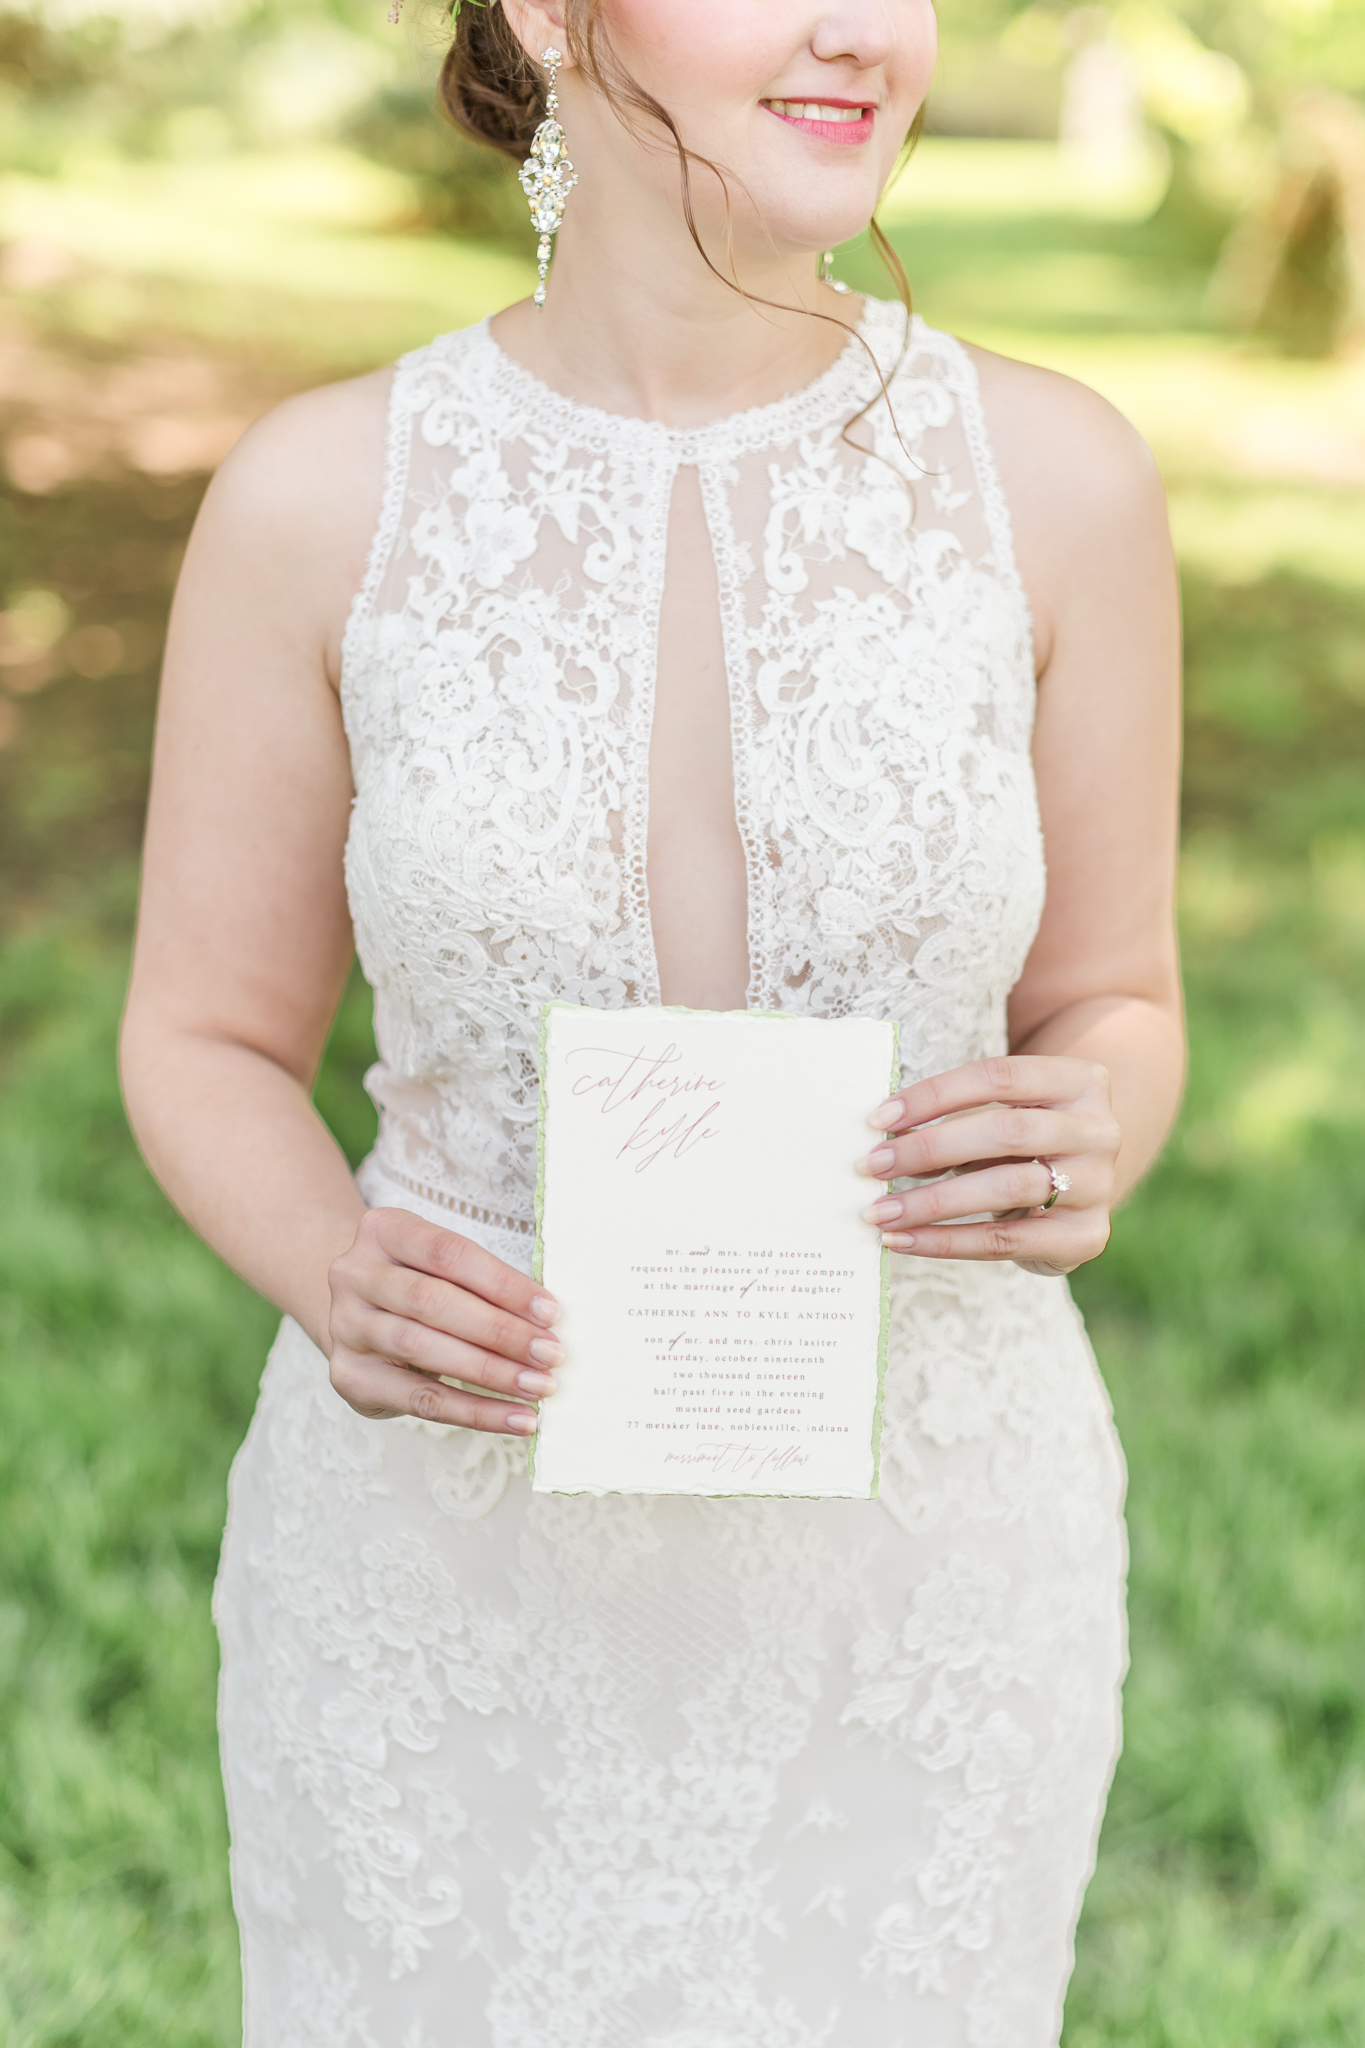 Mustard Seed Gardens Wedding Indianapolis Noblesvile Fishers Wedding Photographer-71.jpg